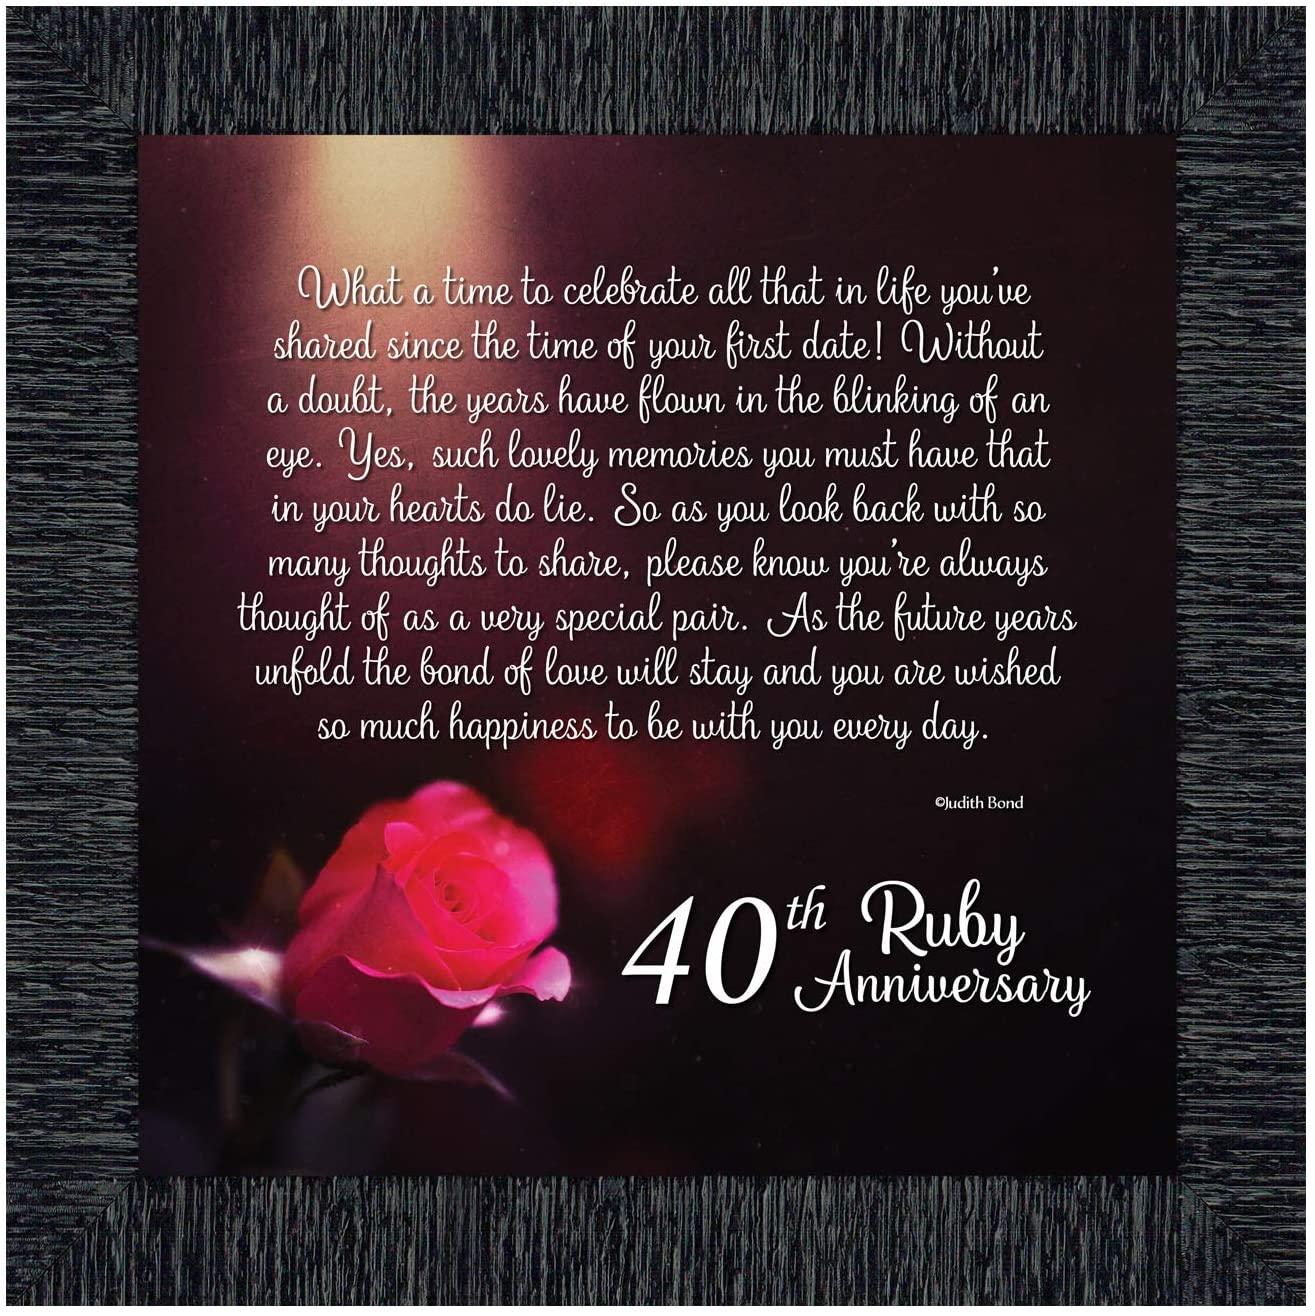 Crossroads Home Décor Ruby Anniversary, Ruby Wedding Anniversary Picture Frame, 40th Wedding Anniversary, 8603CH